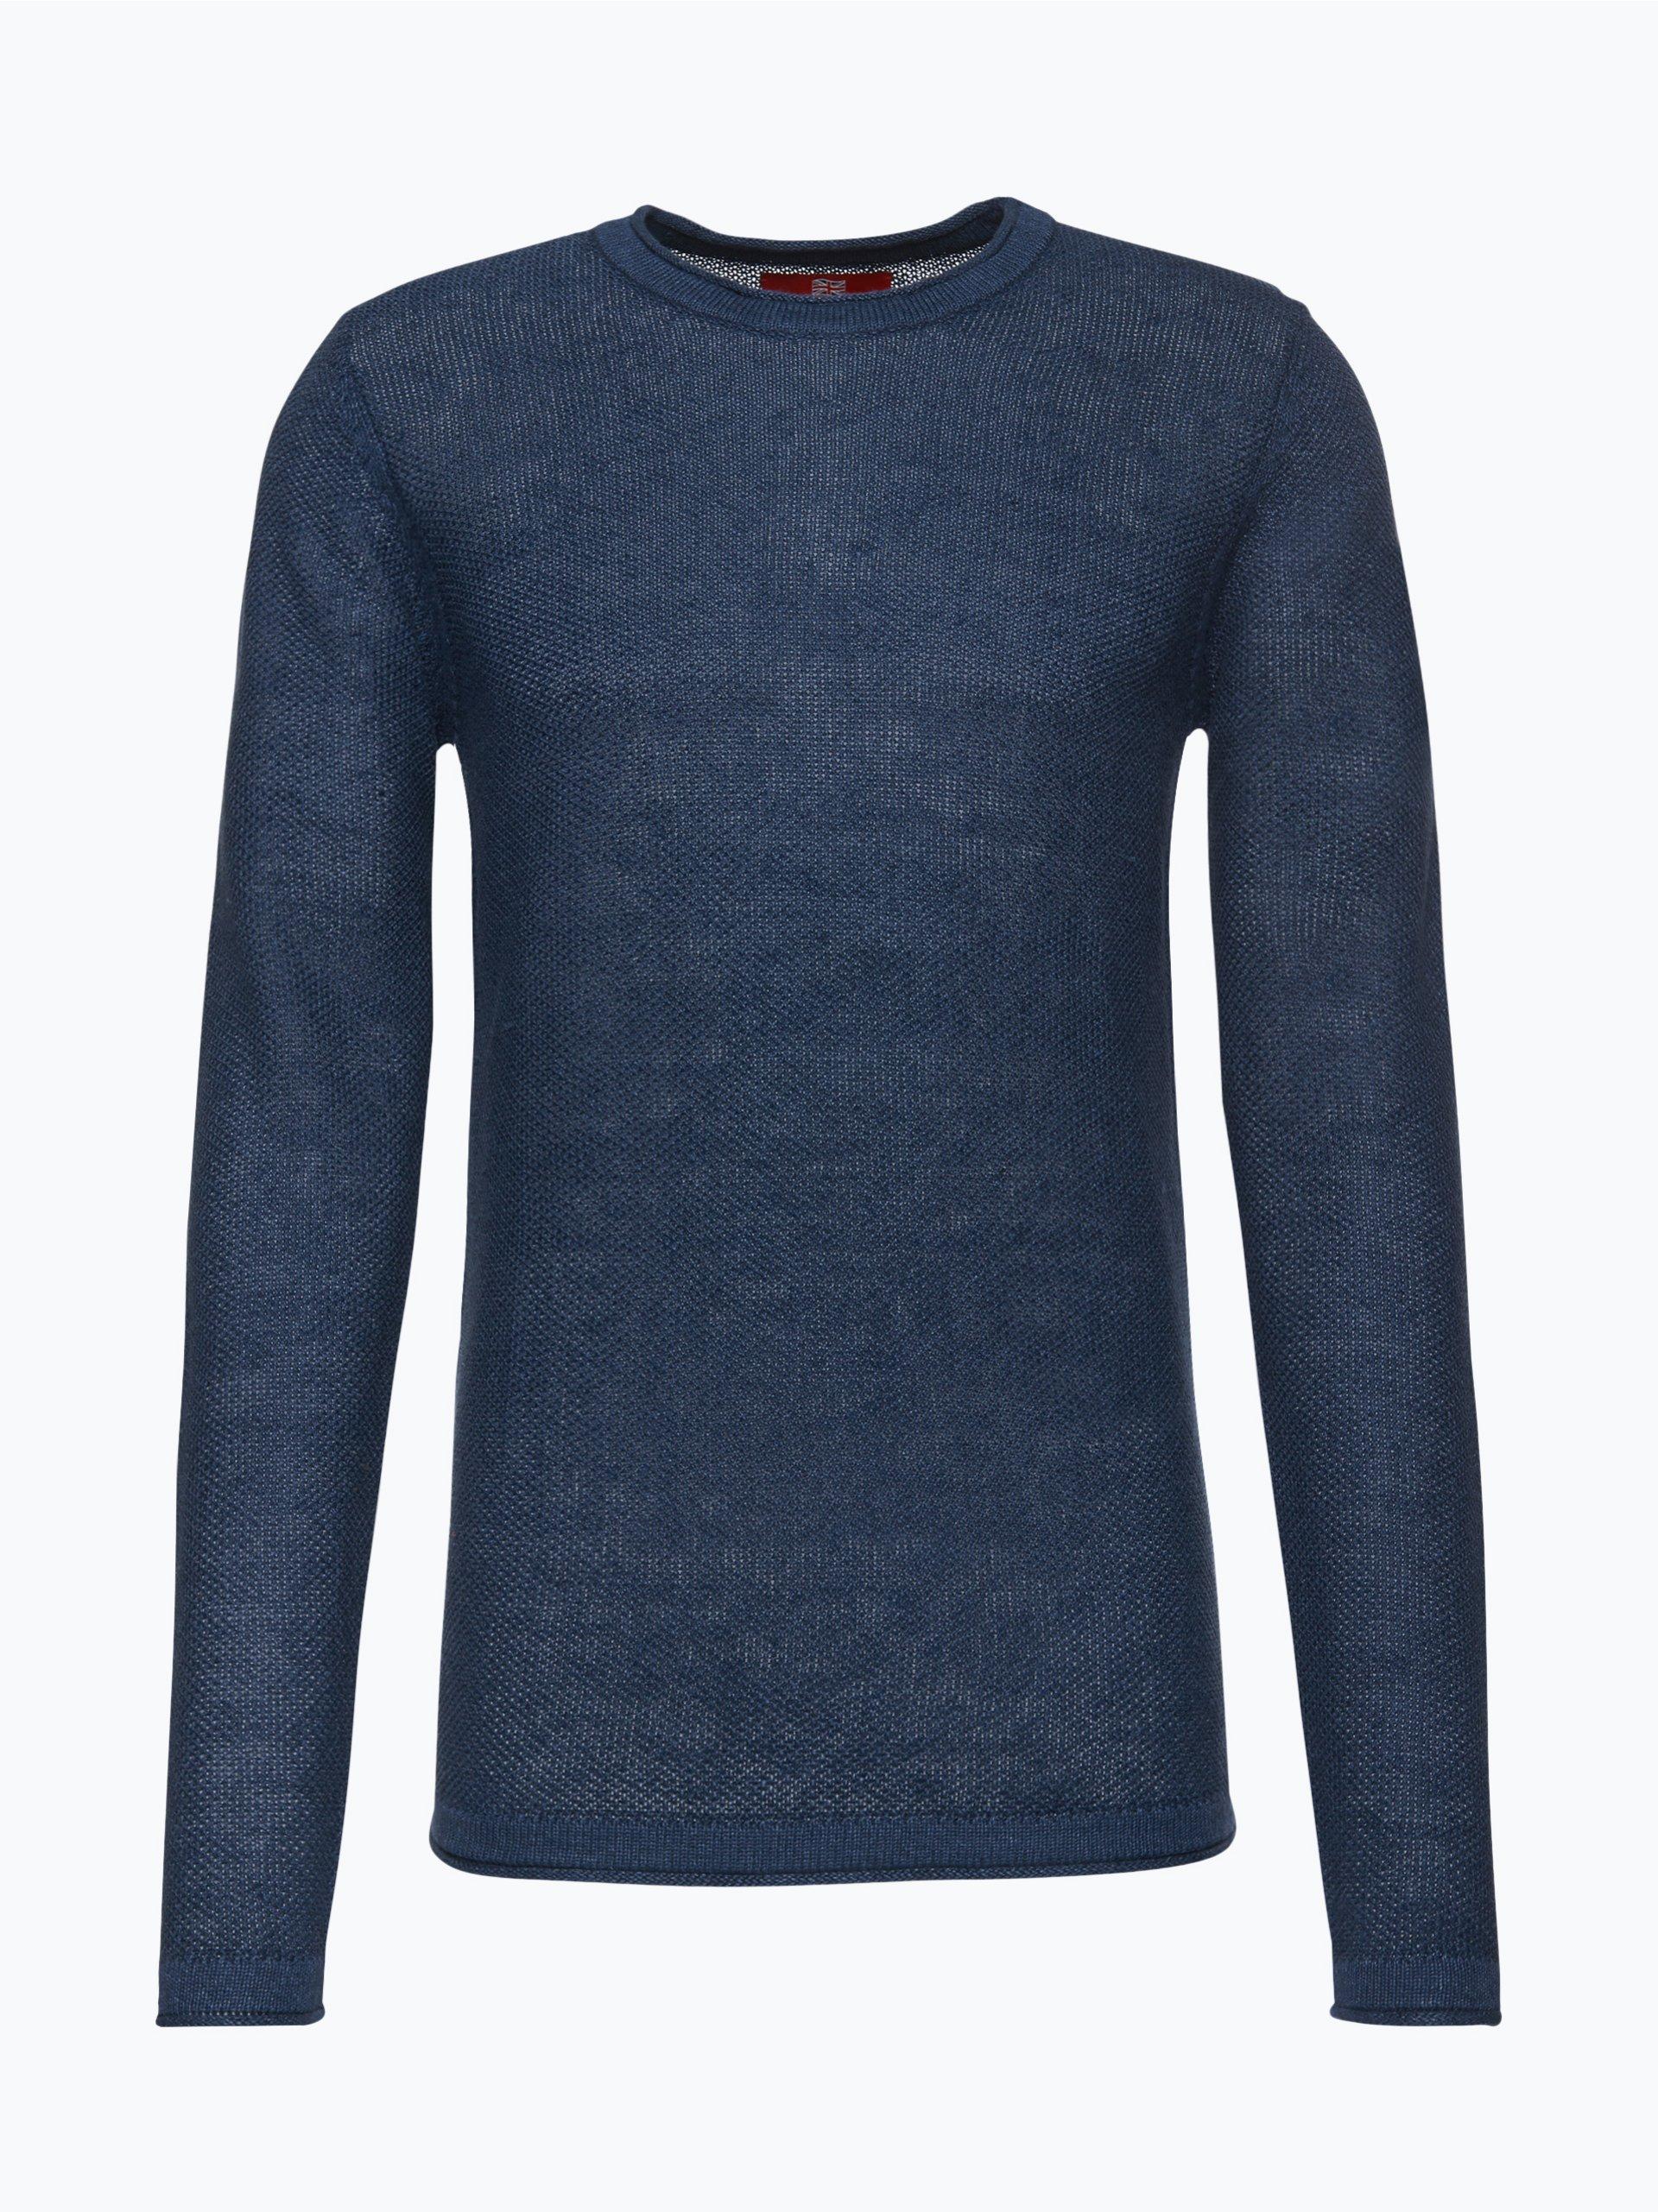 Finshley & Harding London Herren Pullover aus Leinen